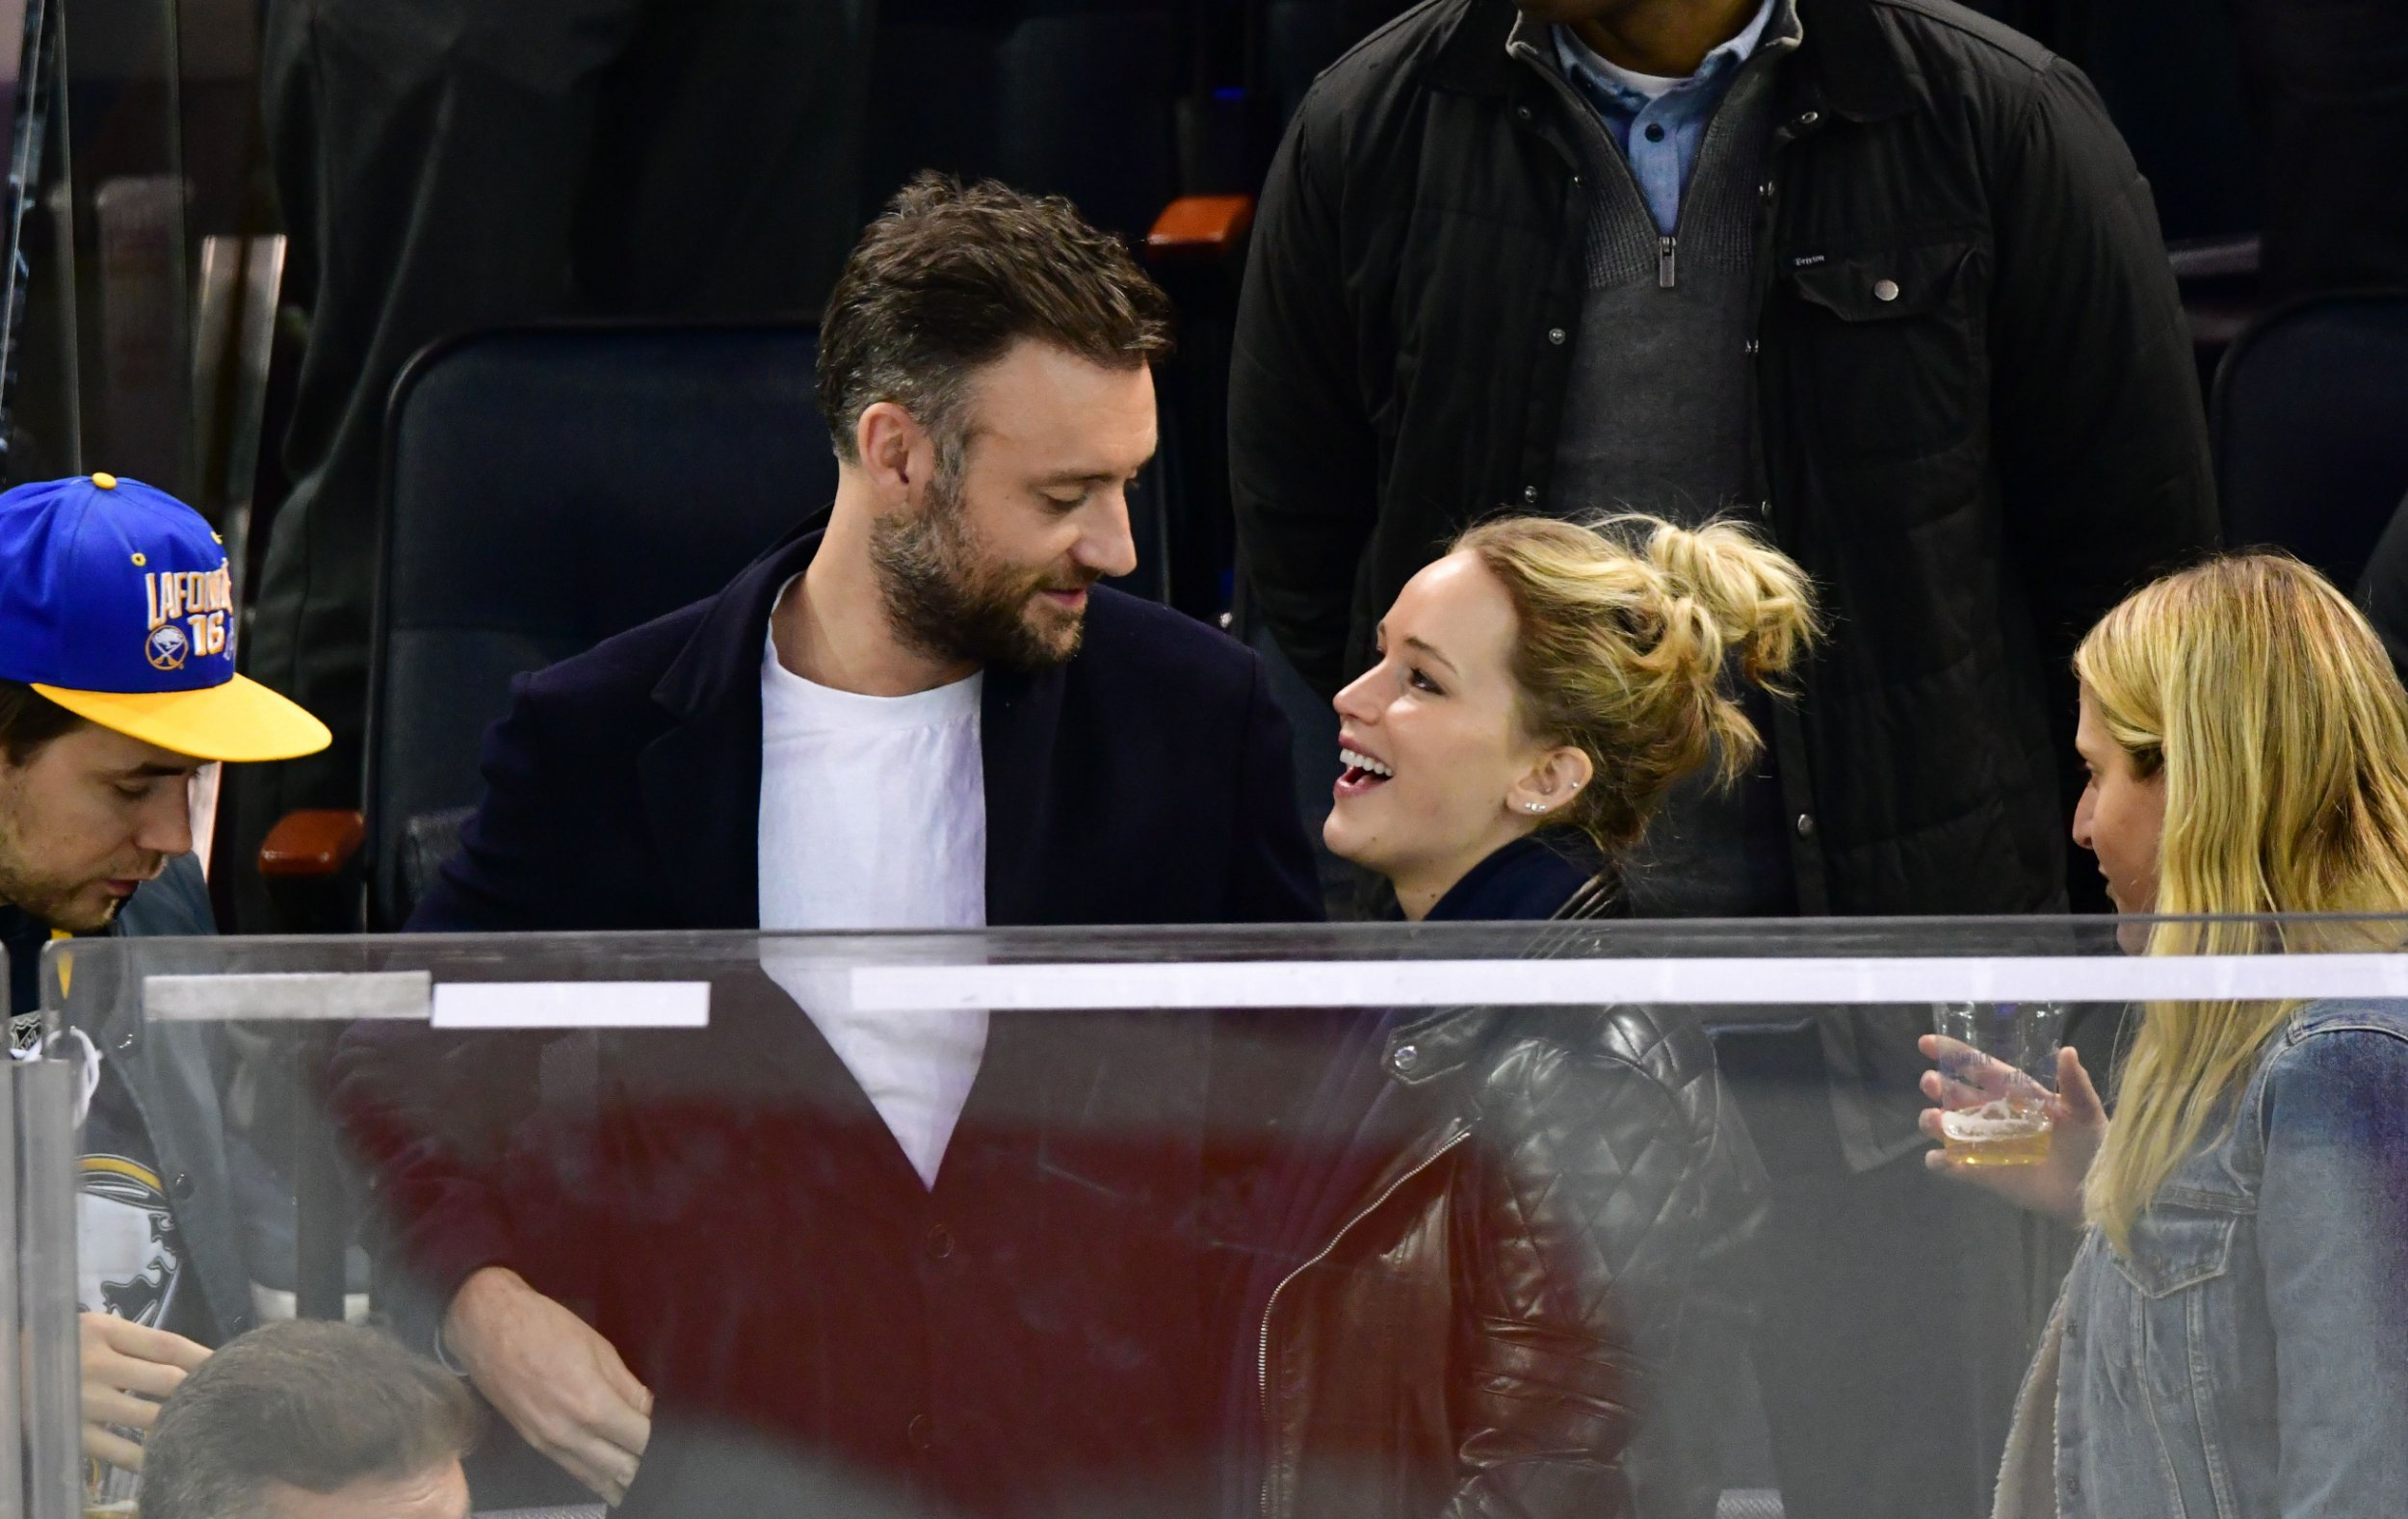 Jennifer Lawrence confirms engagement to art dealer boyfriend Cooke Maroney